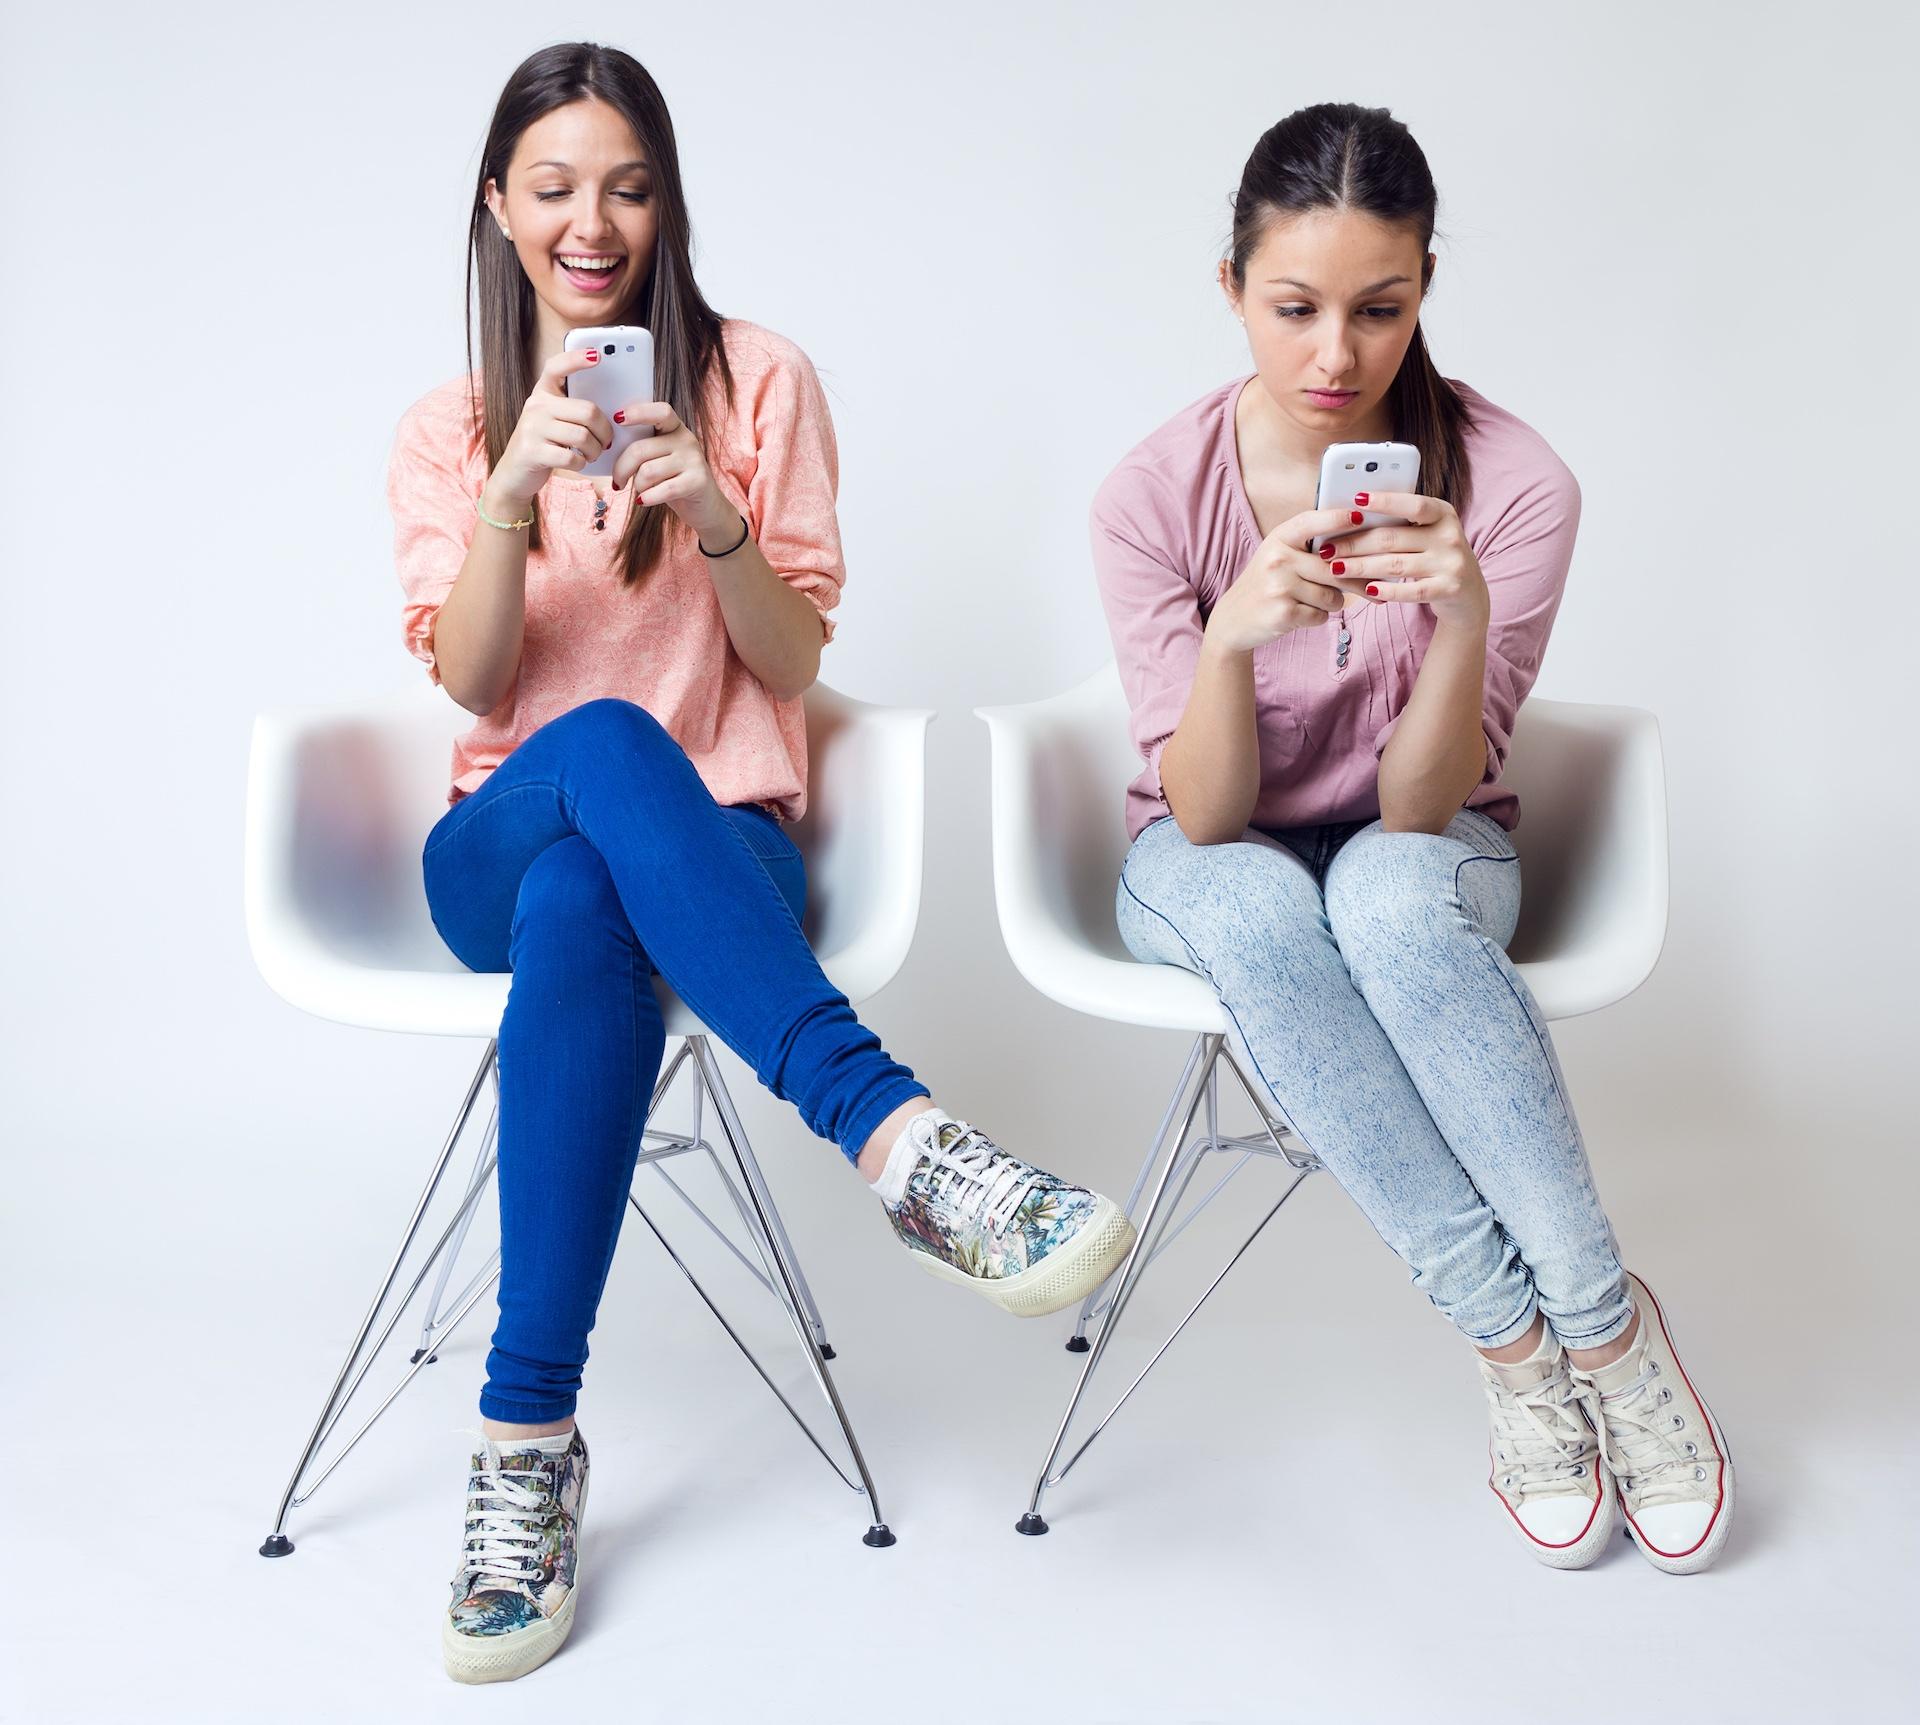 Two Girls Using Smartphones